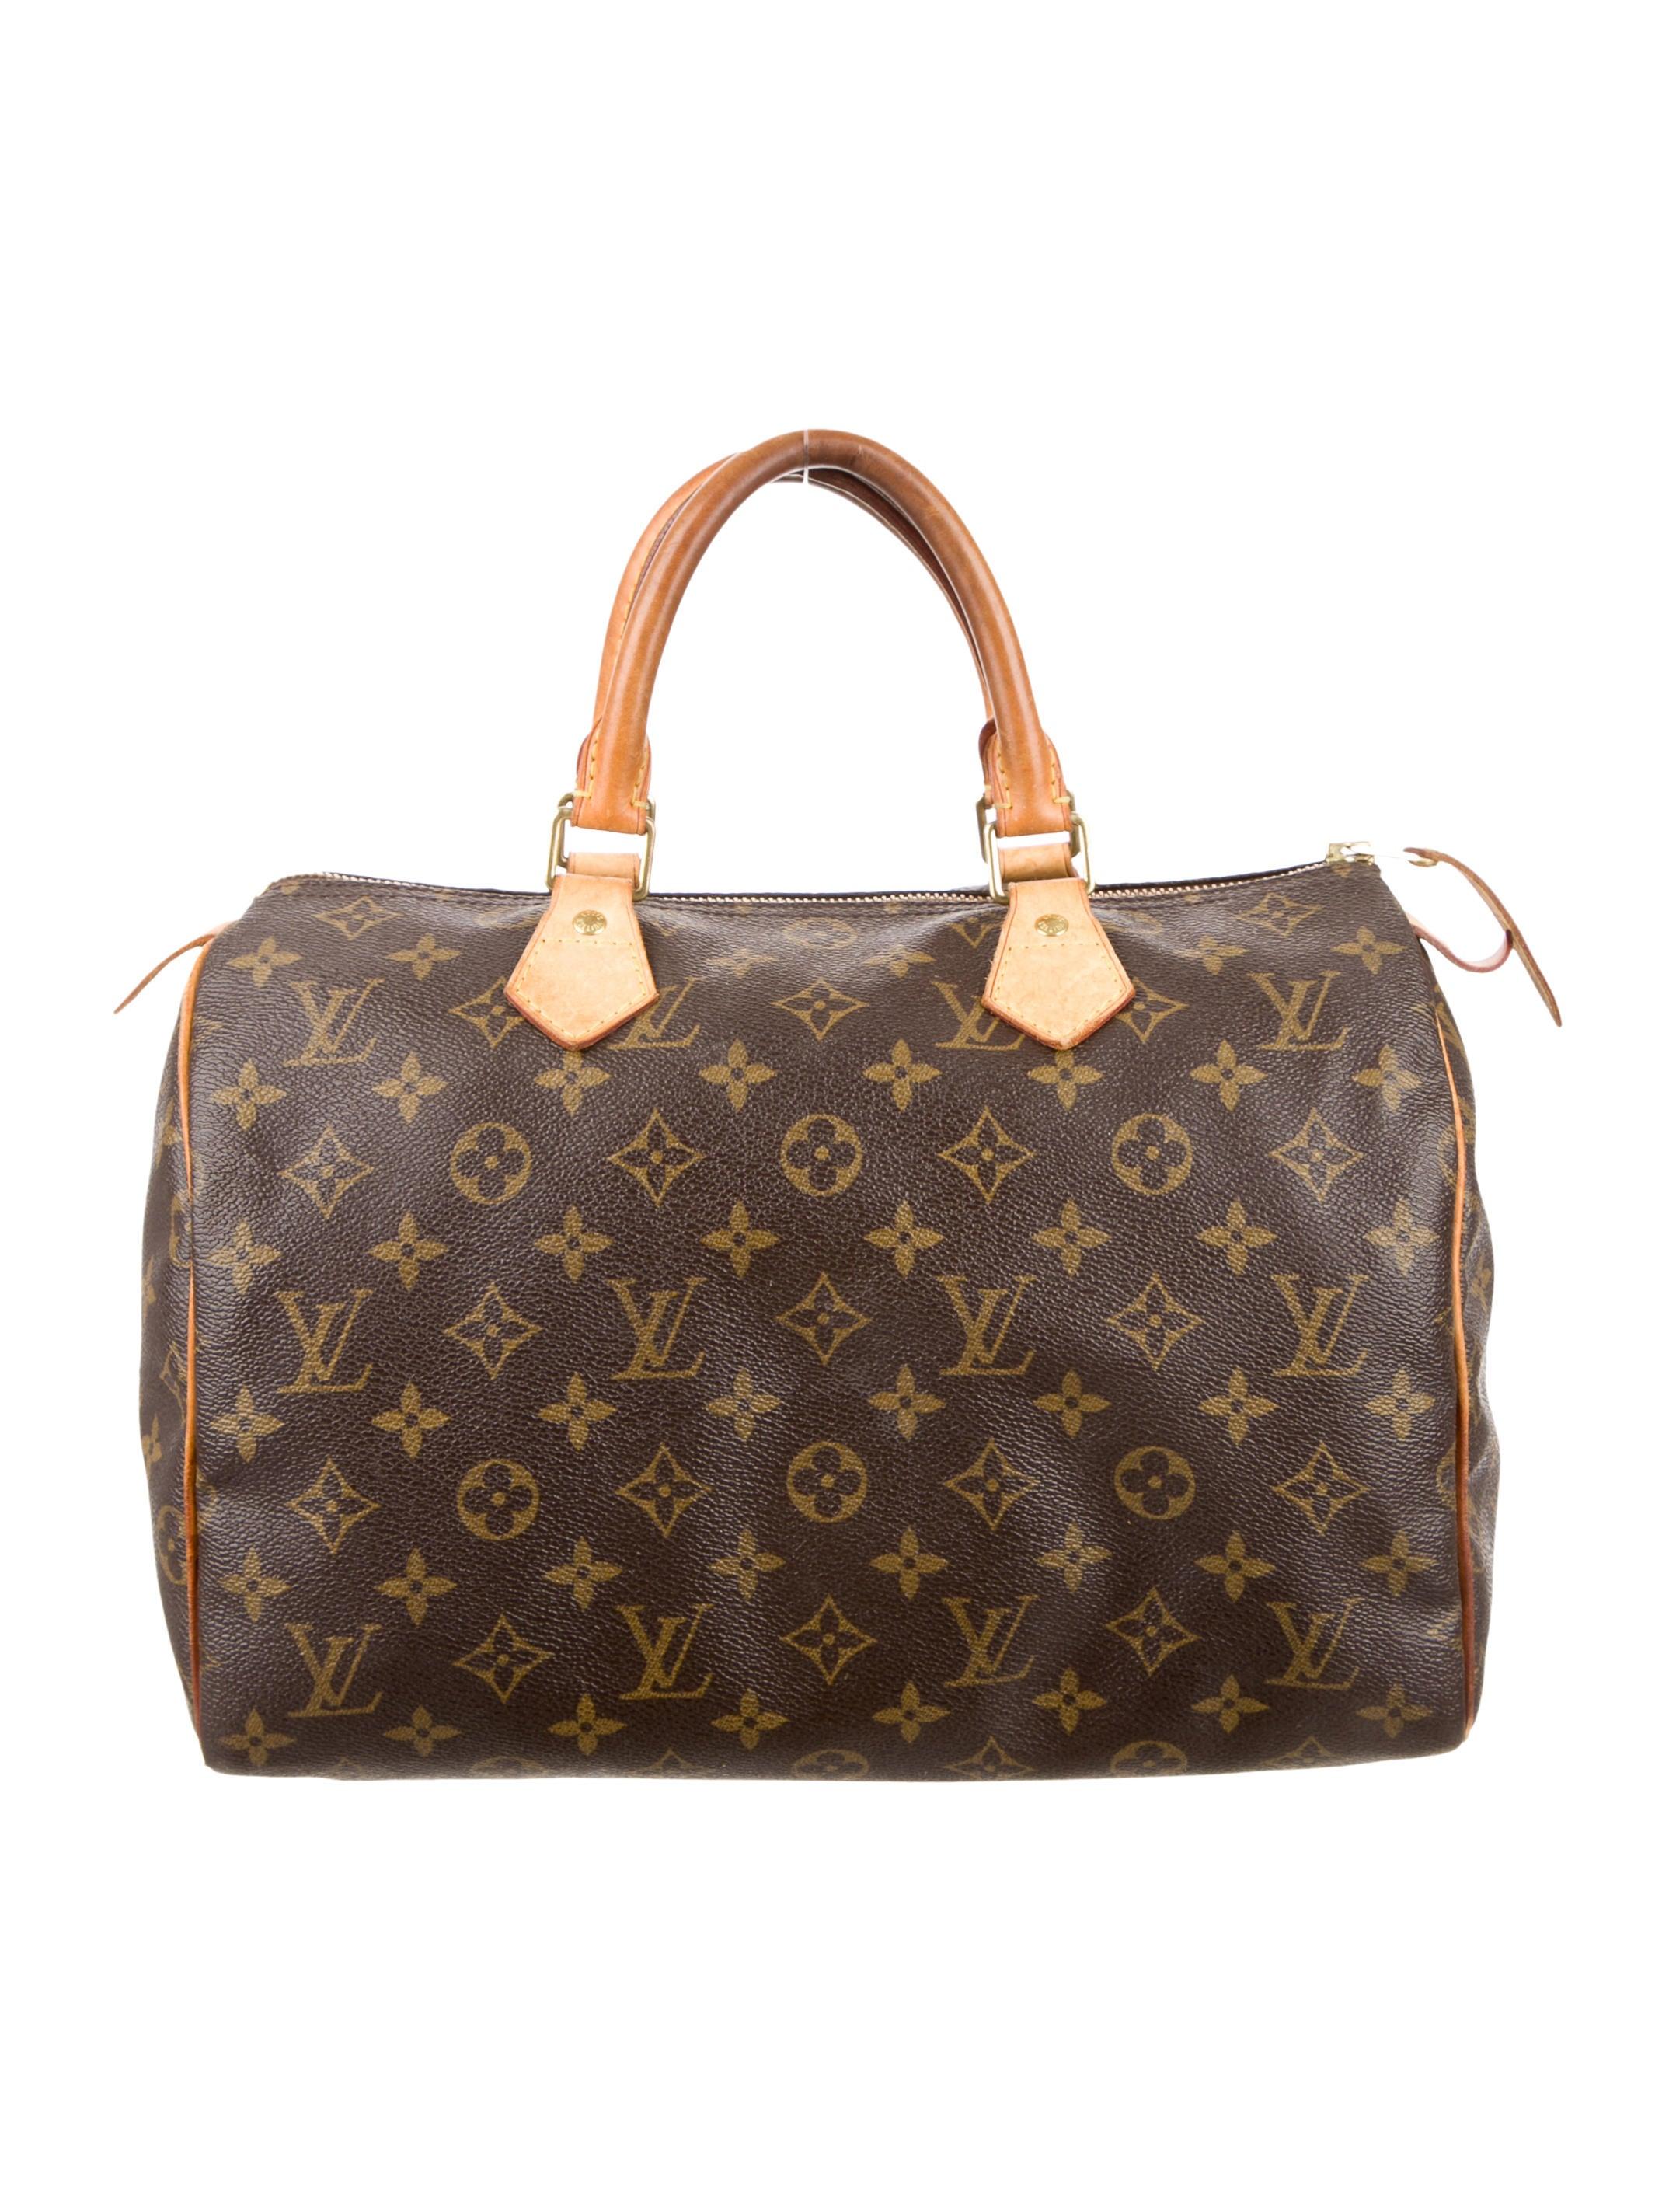 louis vuitton monogram speedy 30 handbags lou65454 the realreal. Black Bedroom Furniture Sets. Home Design Ideas